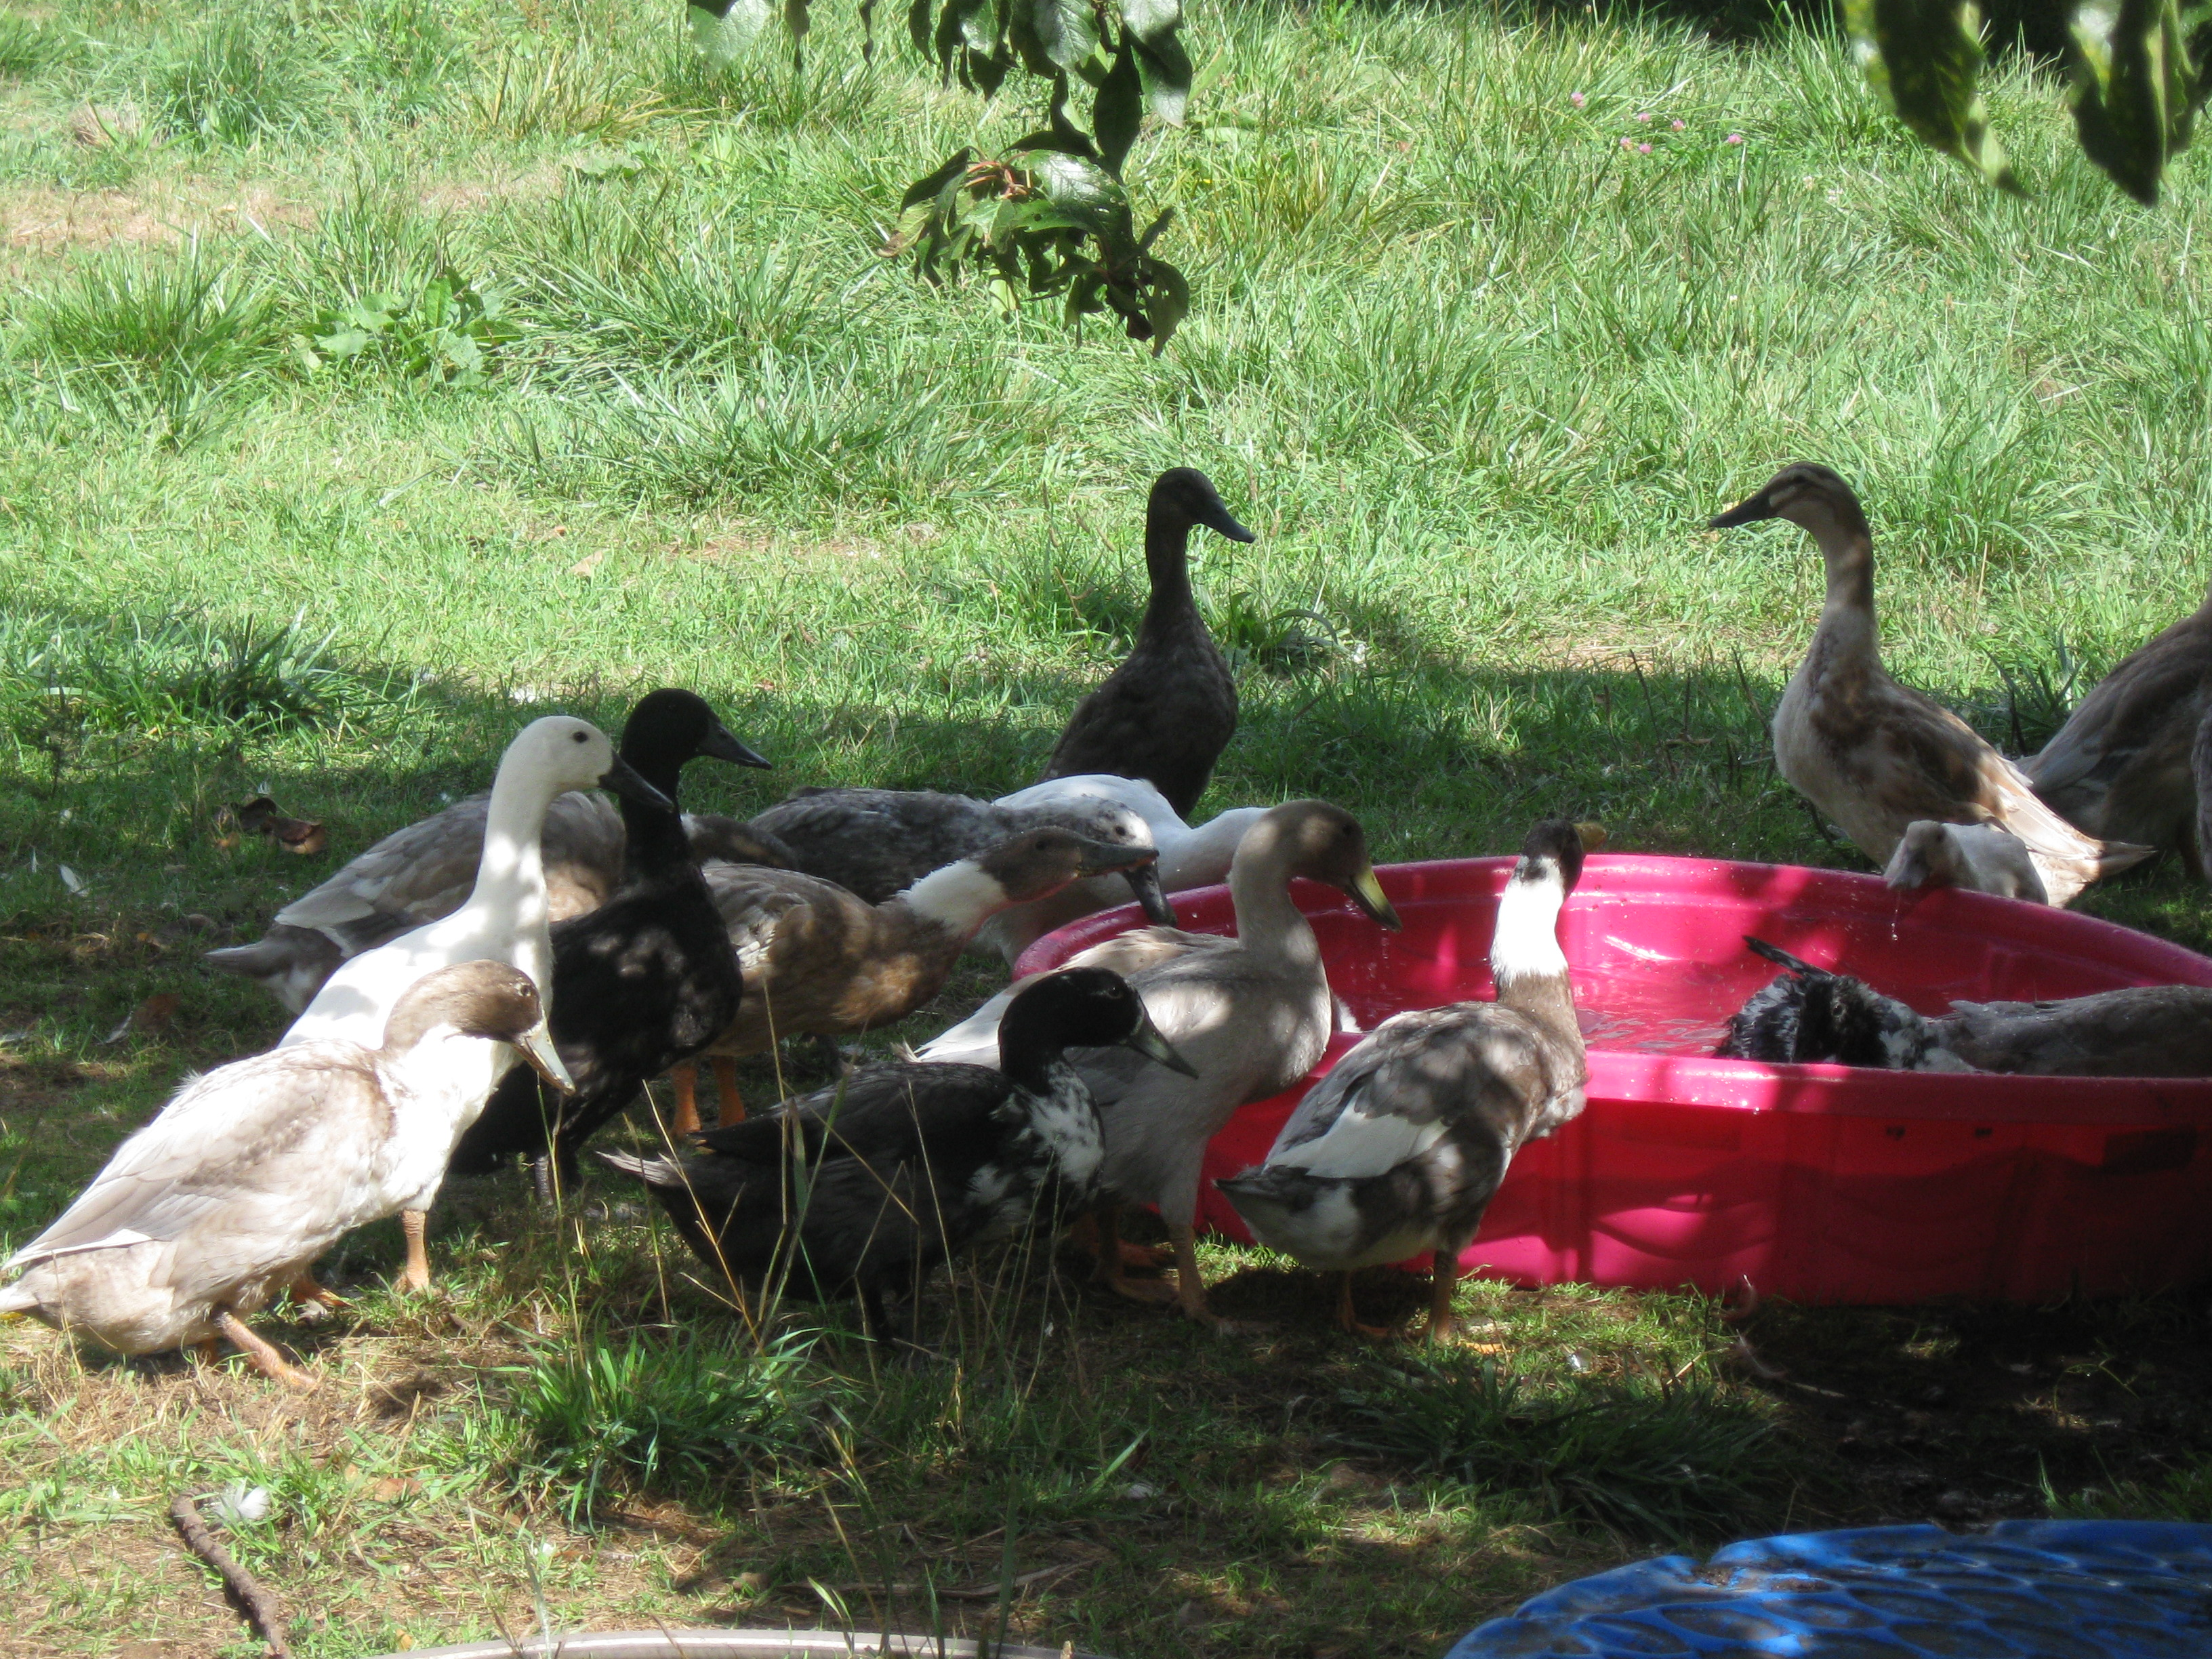 Ducks at WAter